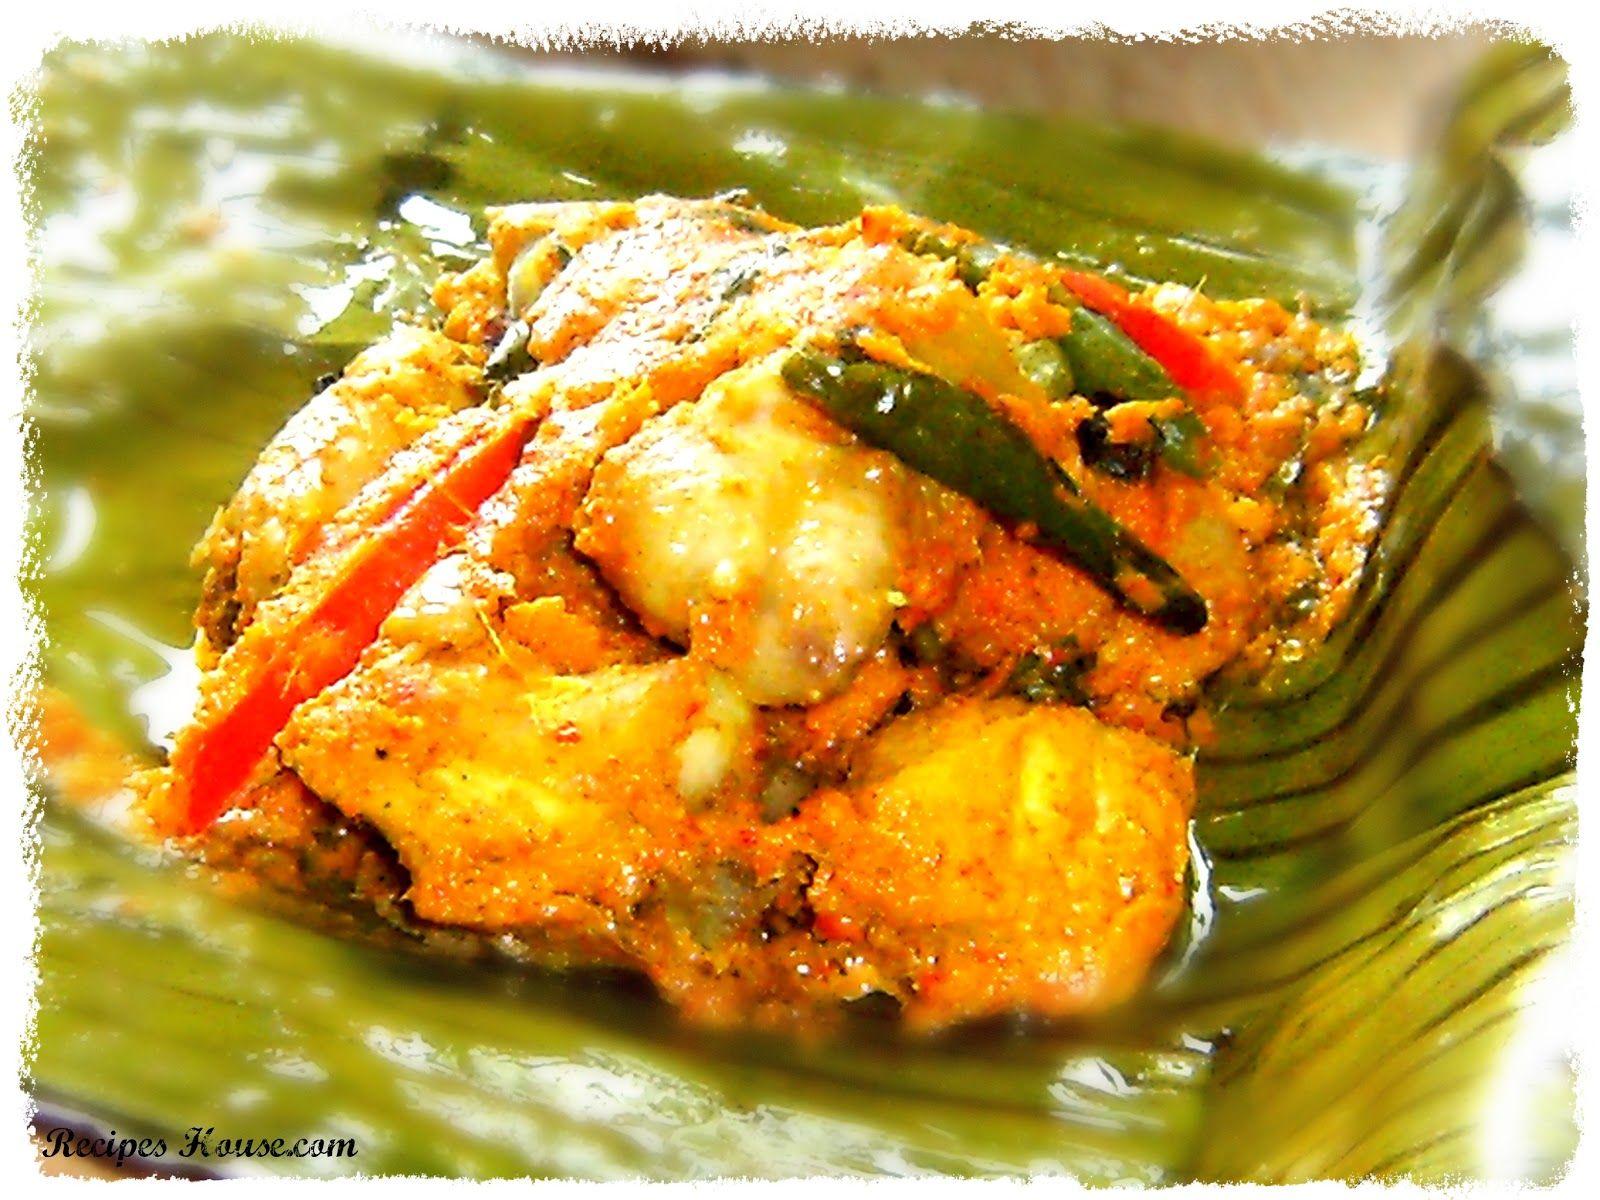 Julia Homemade Pepes Ayam Kukus Resep Masakan Resep Masakan Malaysia Resep